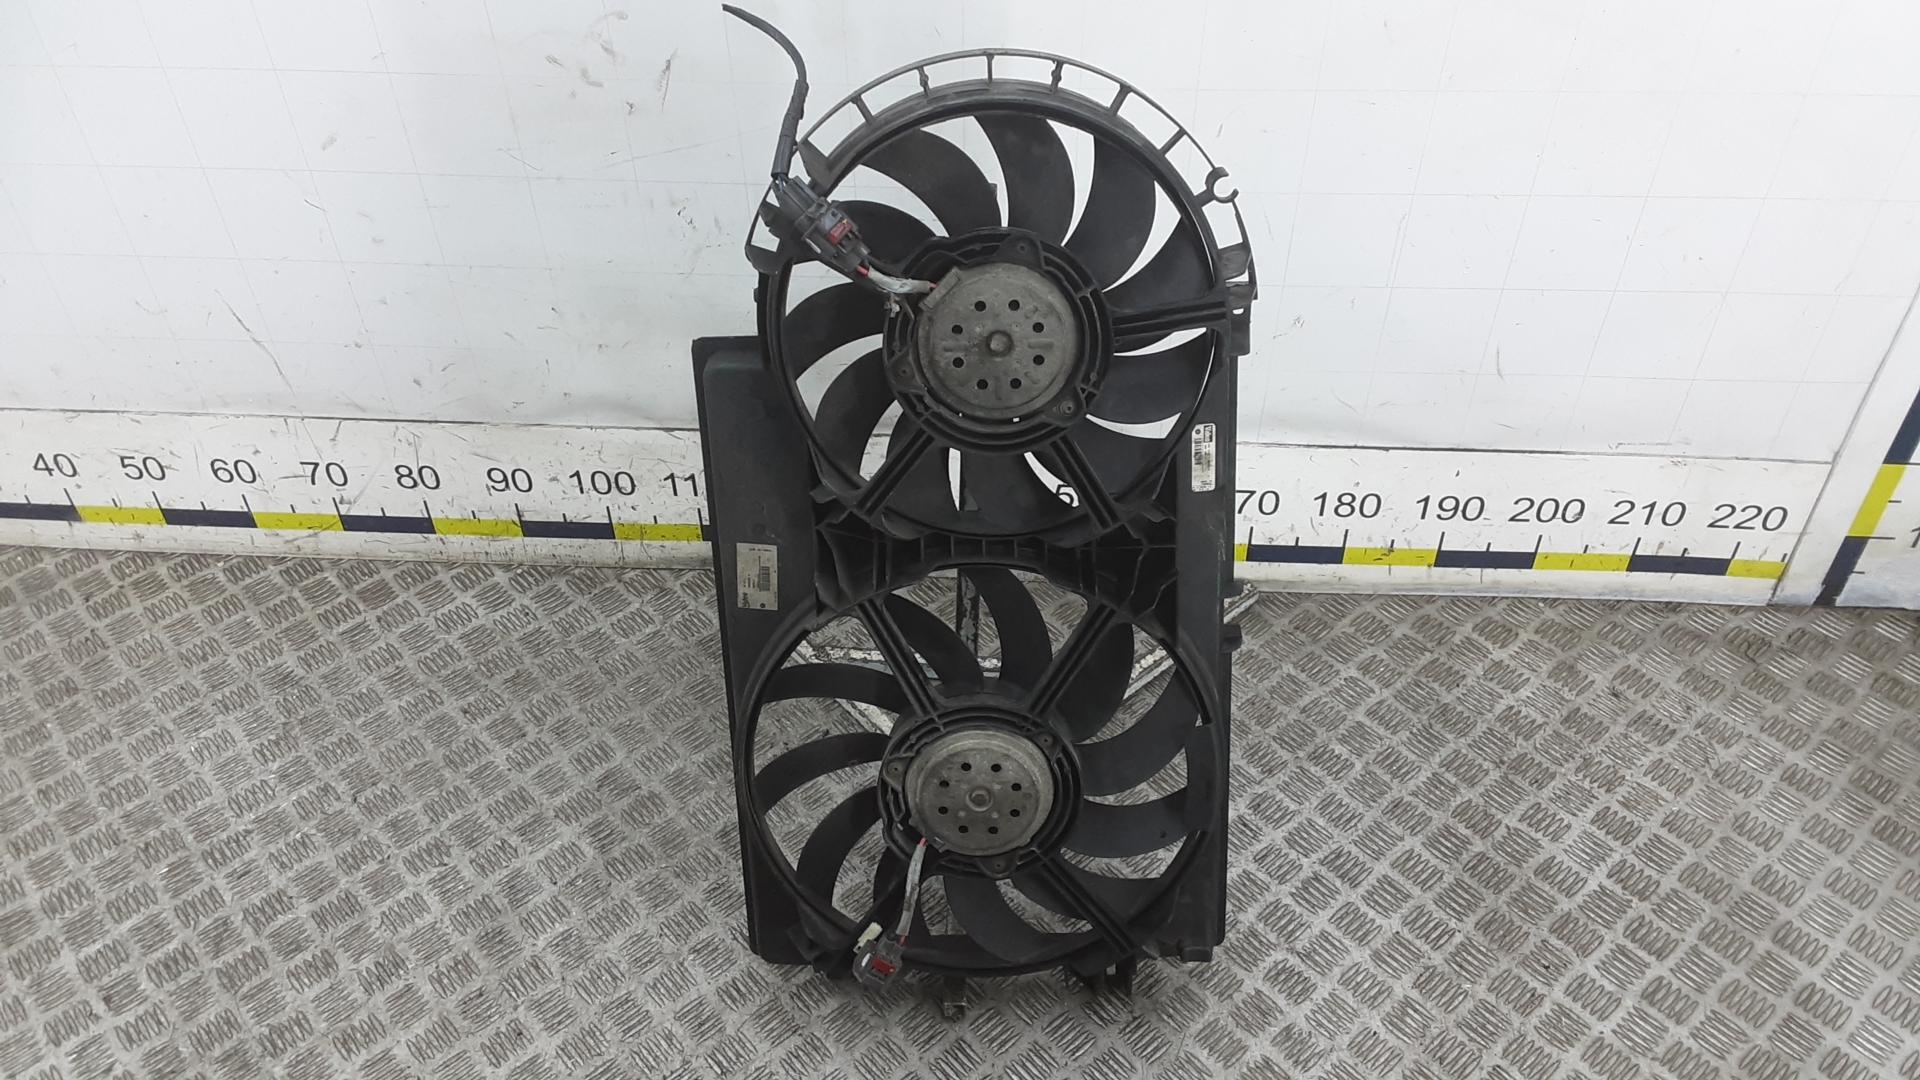 Вентилятор радиатора, CHRYSLER, VOYAGER 4, 2005